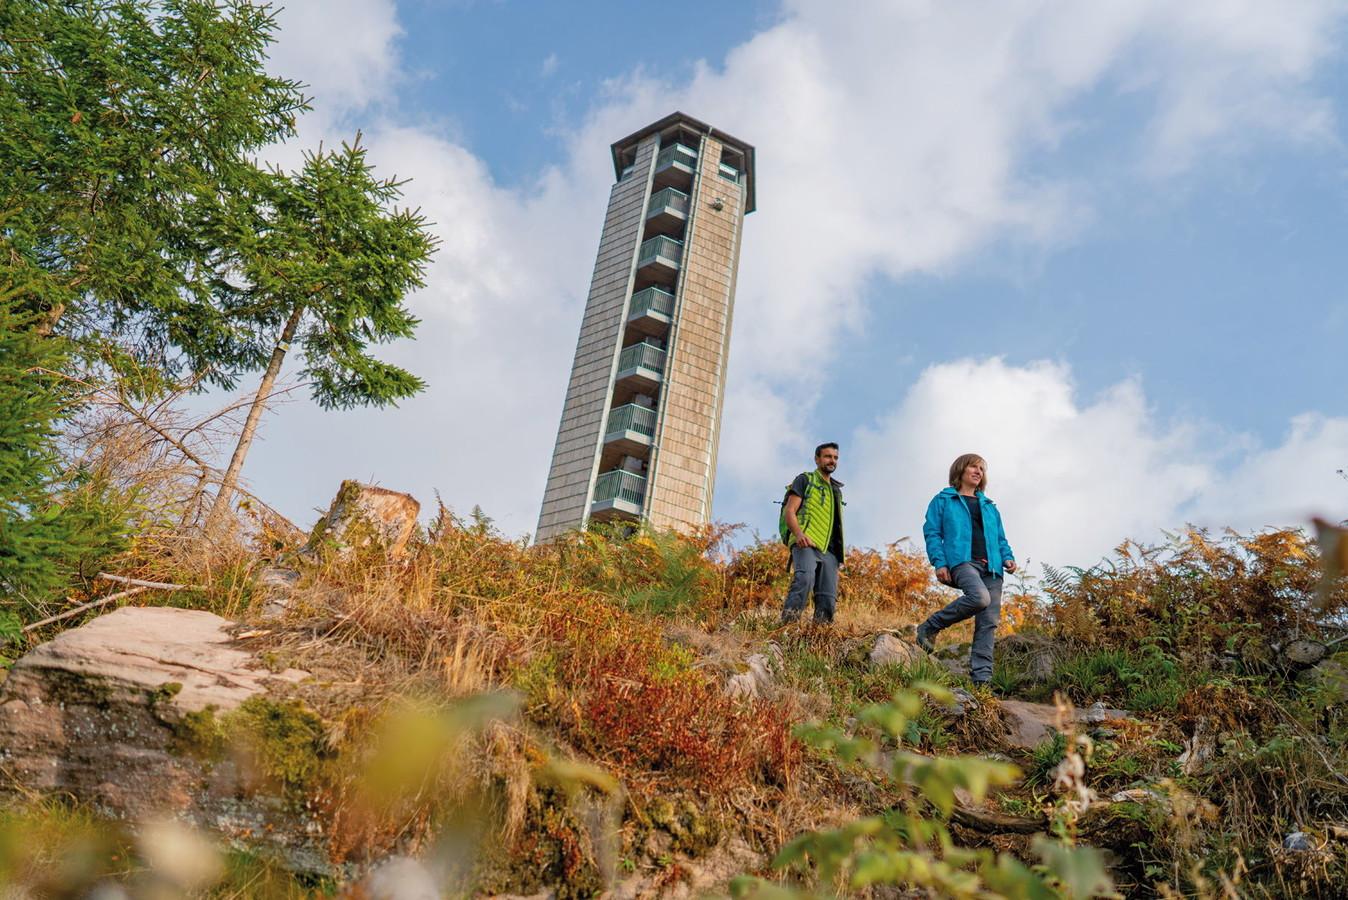 Anspruchsvolles Wandern auf dem Maisacher Turmsteig am Buchkopfturm Oppenau.